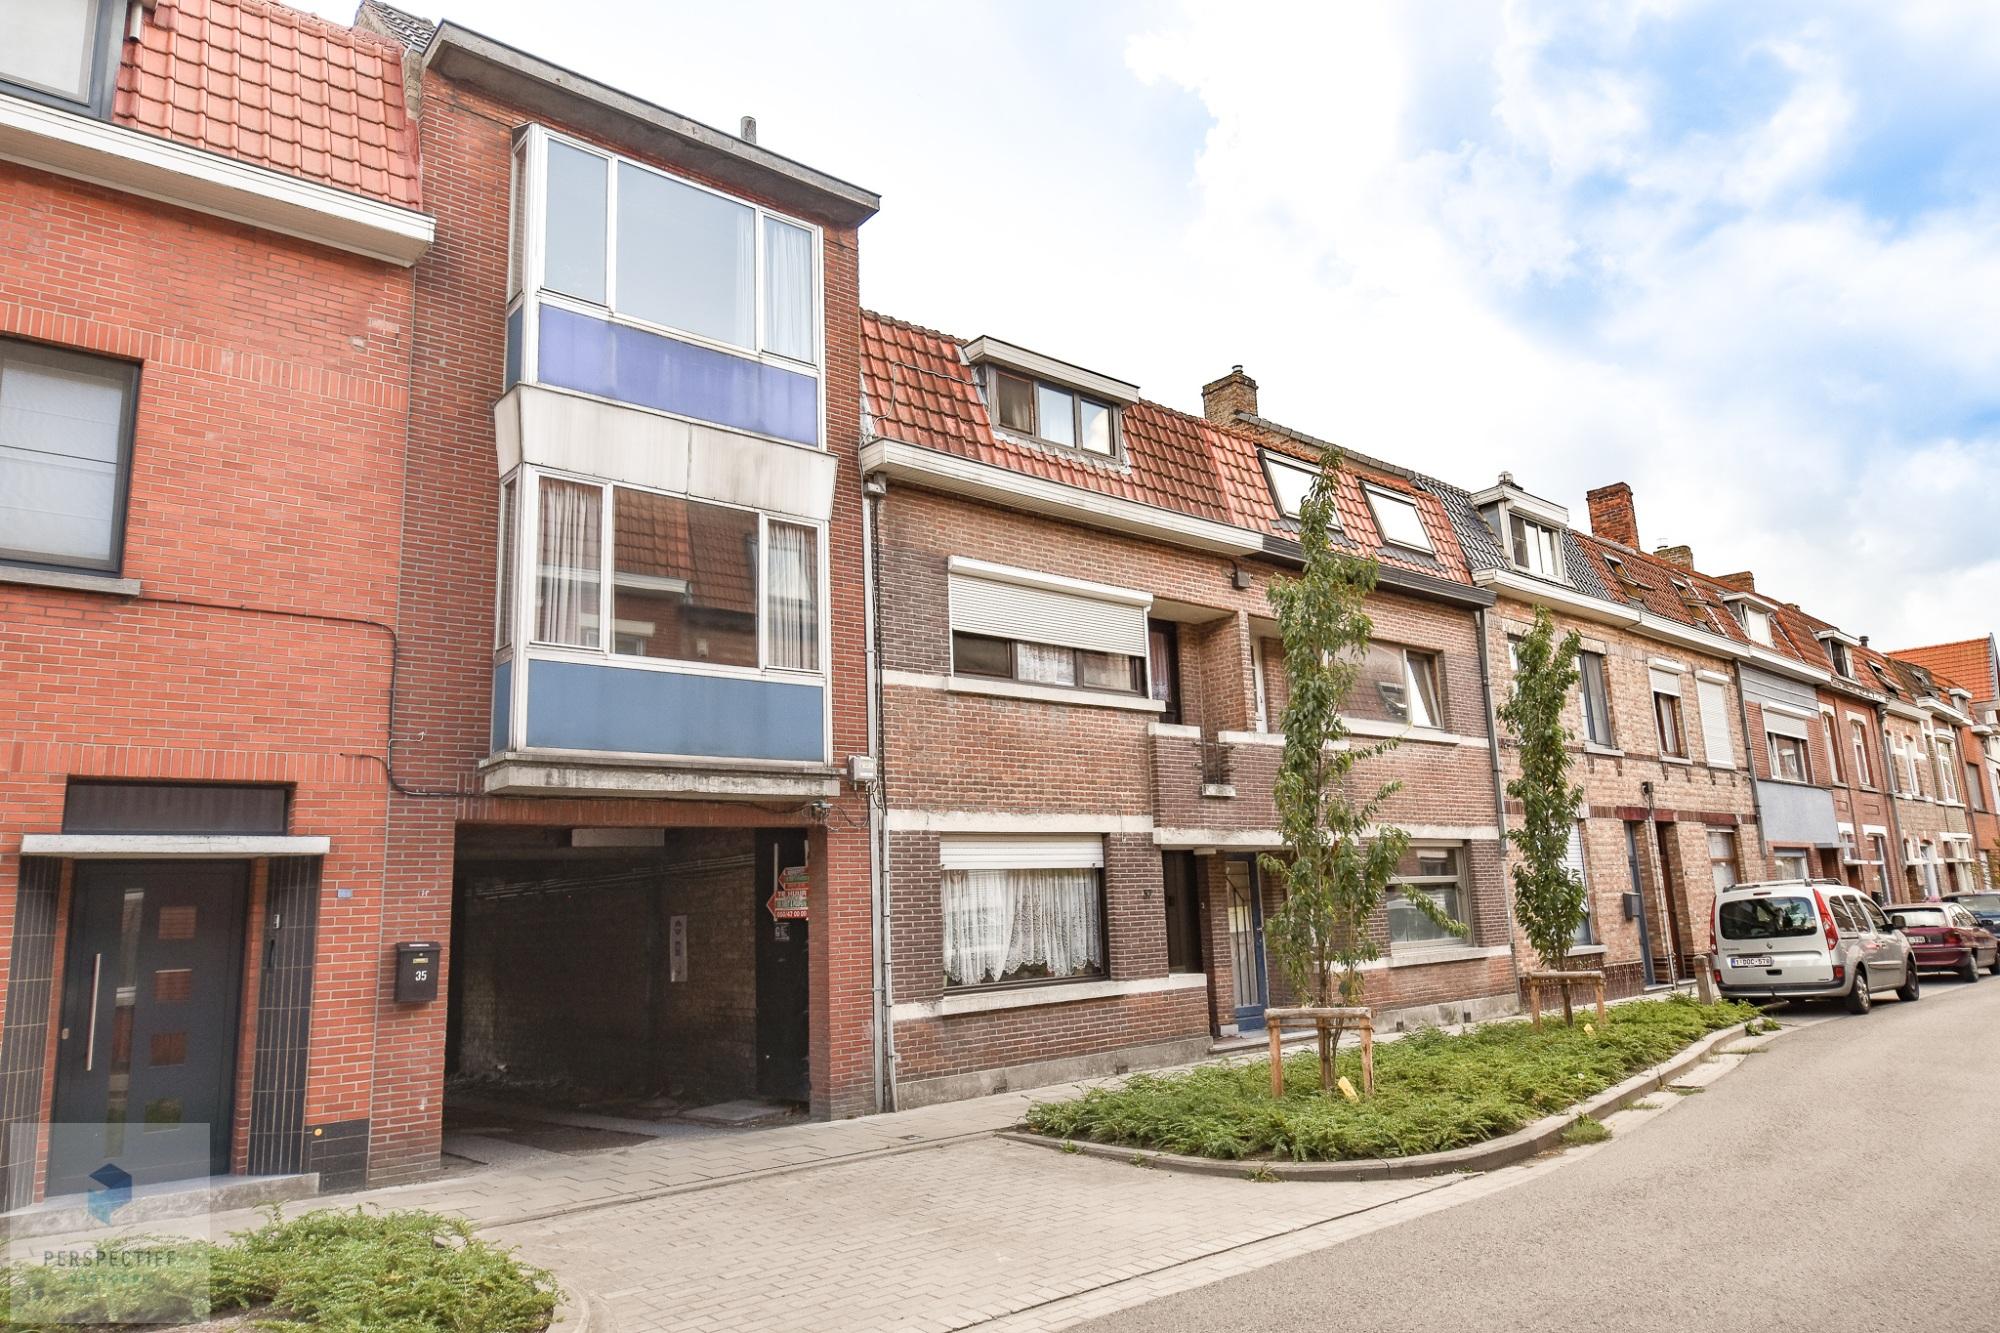 DUPLEX appartement nabij CENTRUM BRUGGE